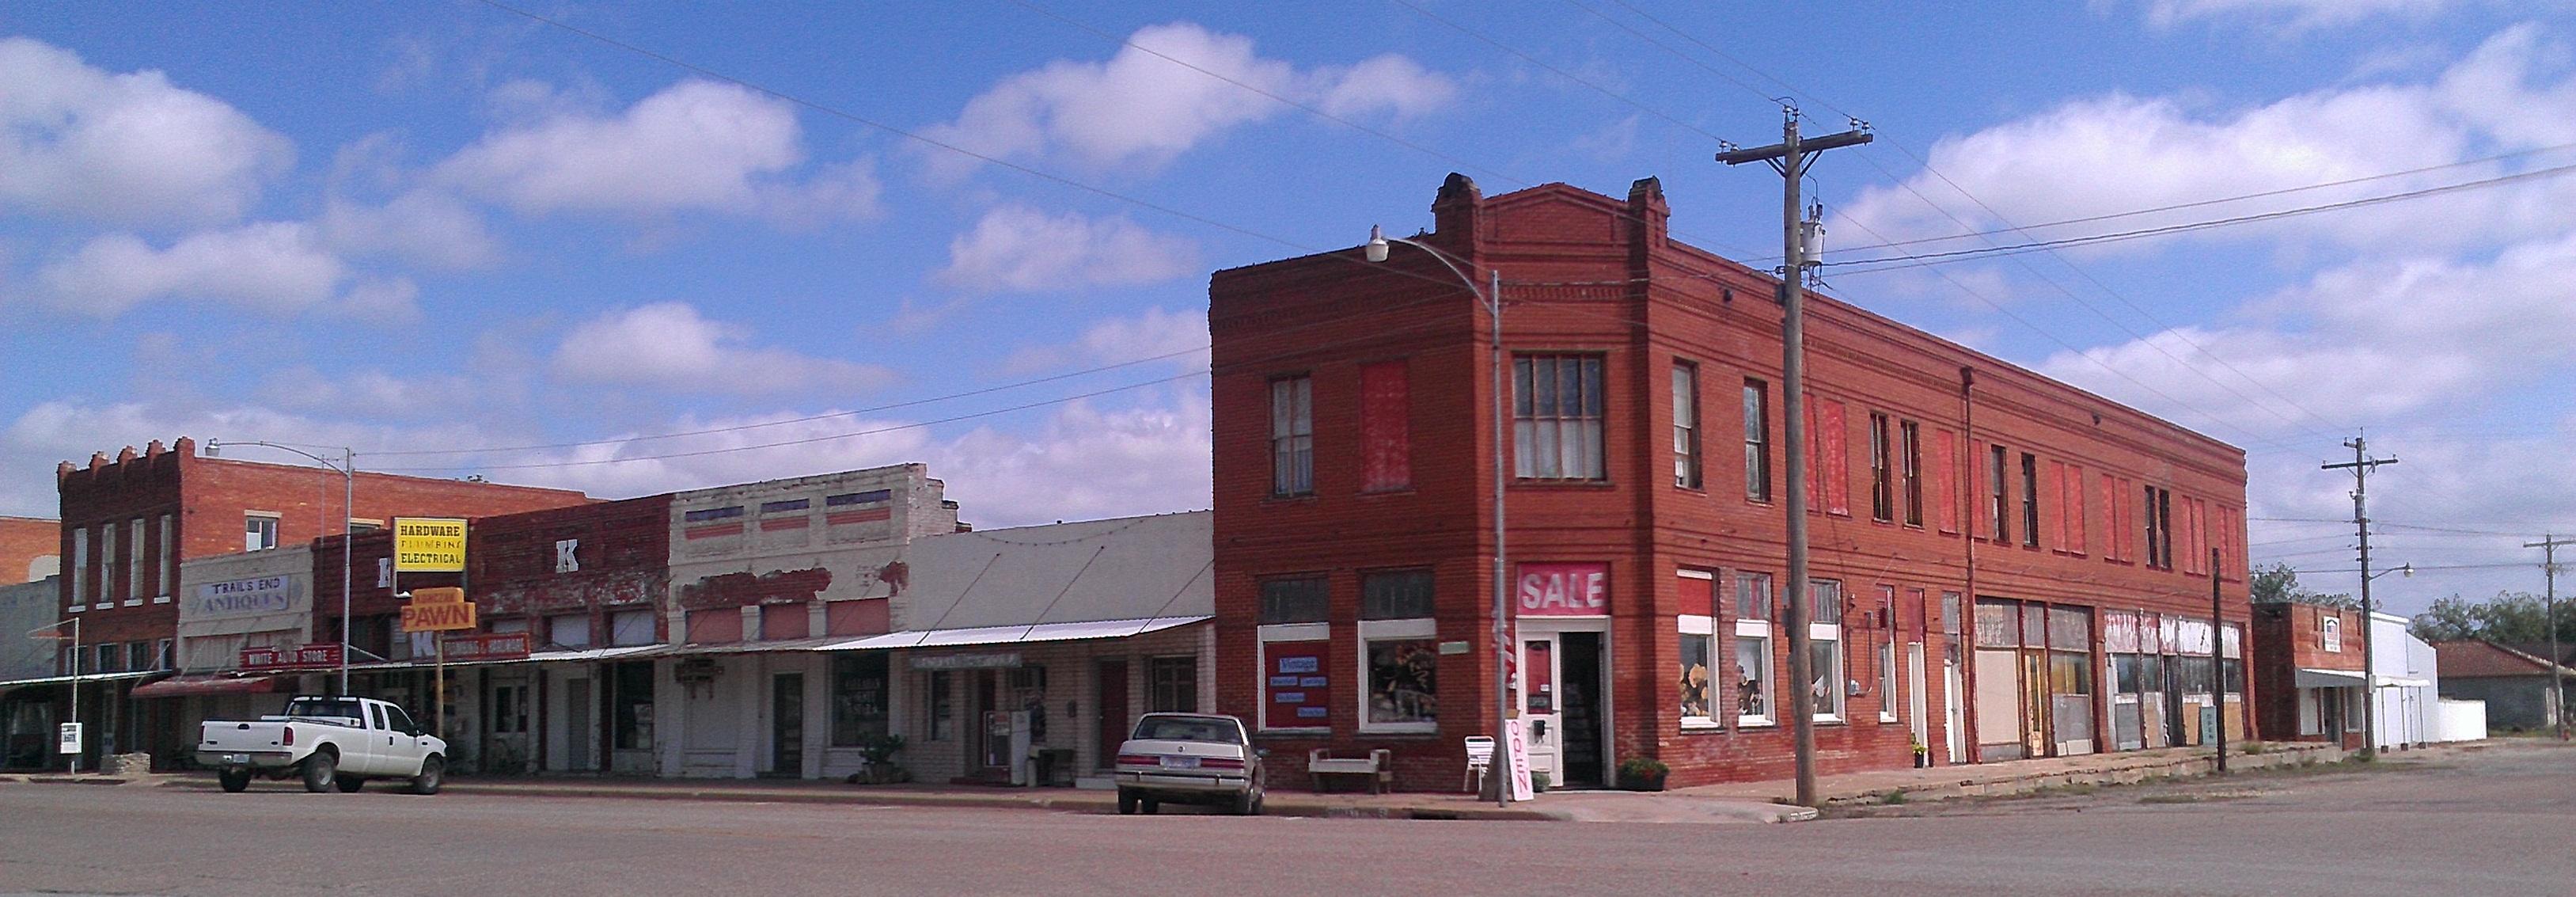 Baird, Teksas